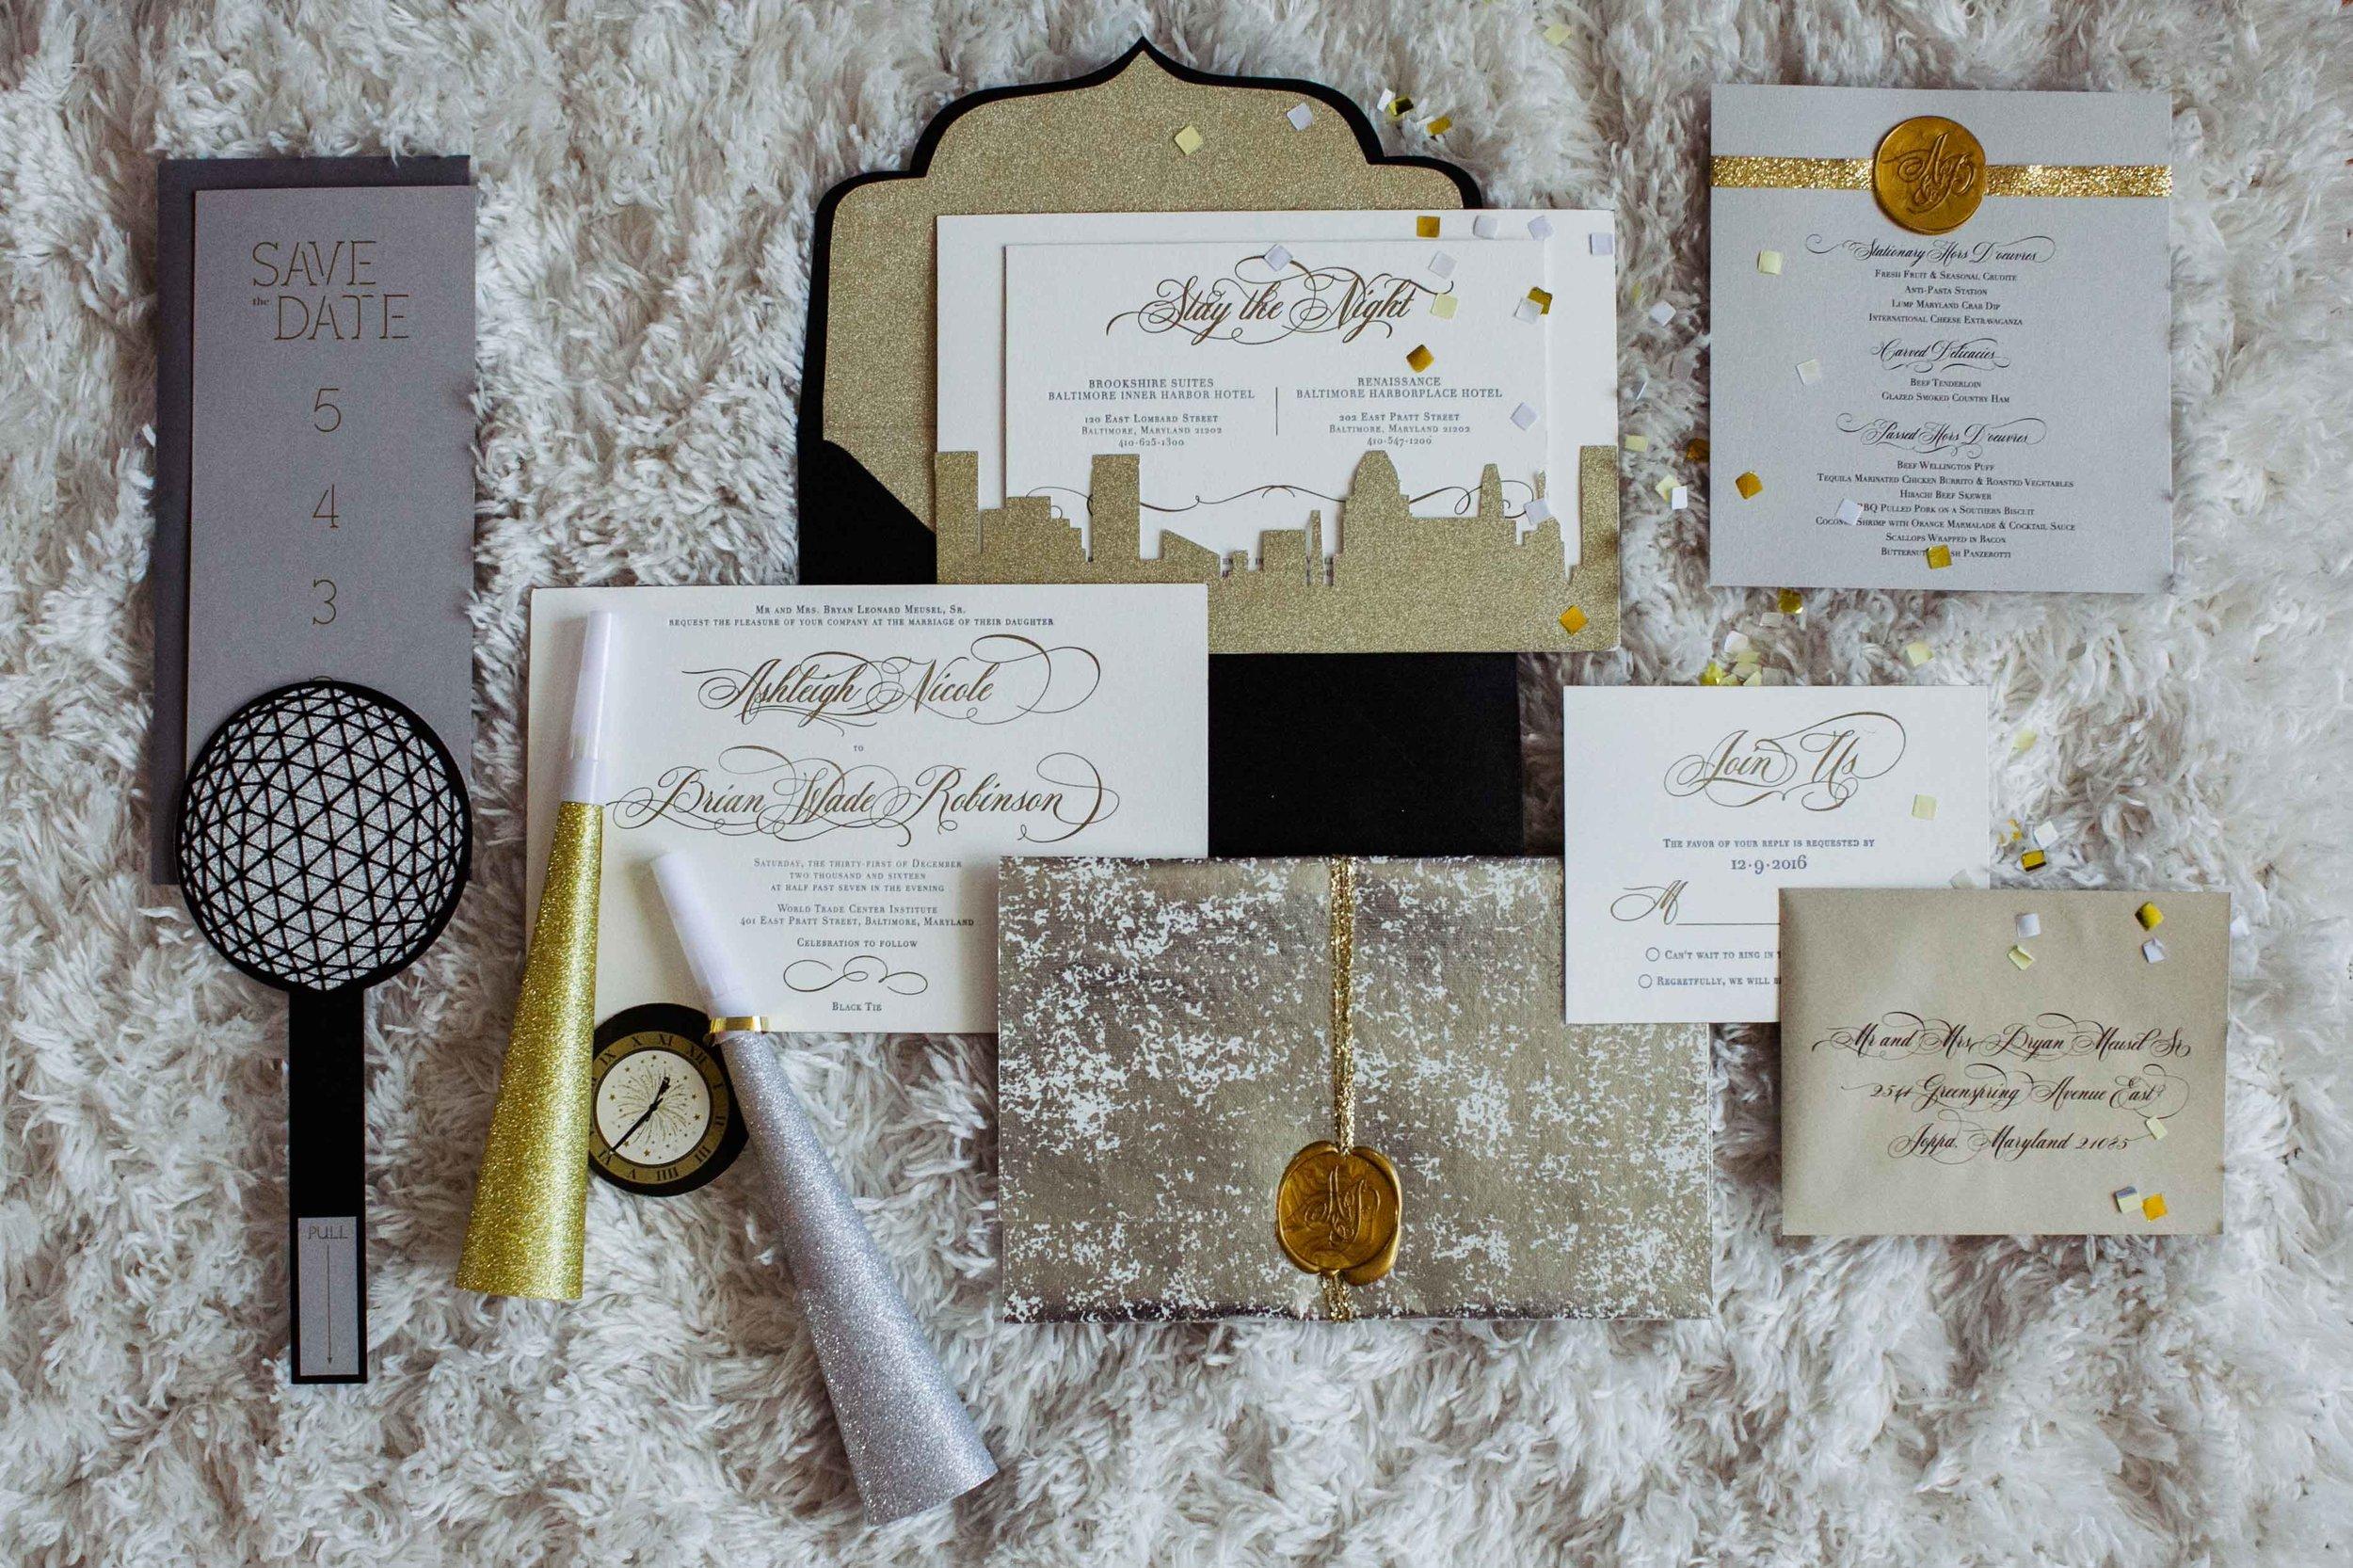 Type-A-Invitations-Robinson-Custom-Letterpress-Wedding-Invitations-New-Years-Eve-web.jpg